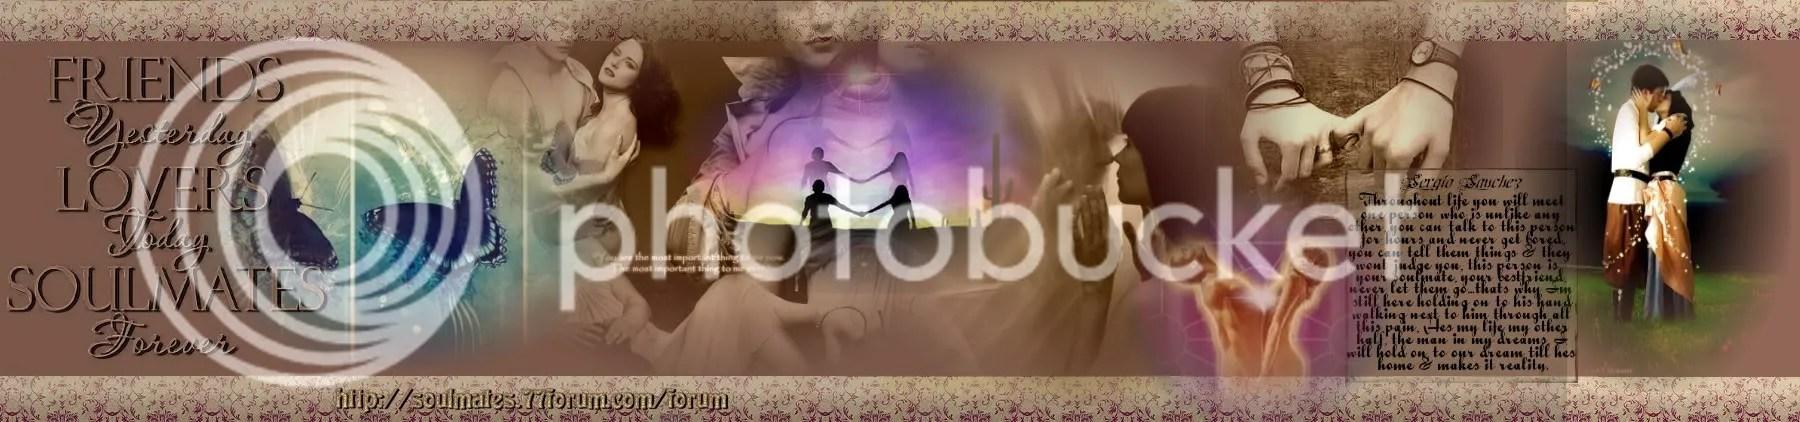 http://soulmates.77forum.com/forum photo c2bcd821.jpg